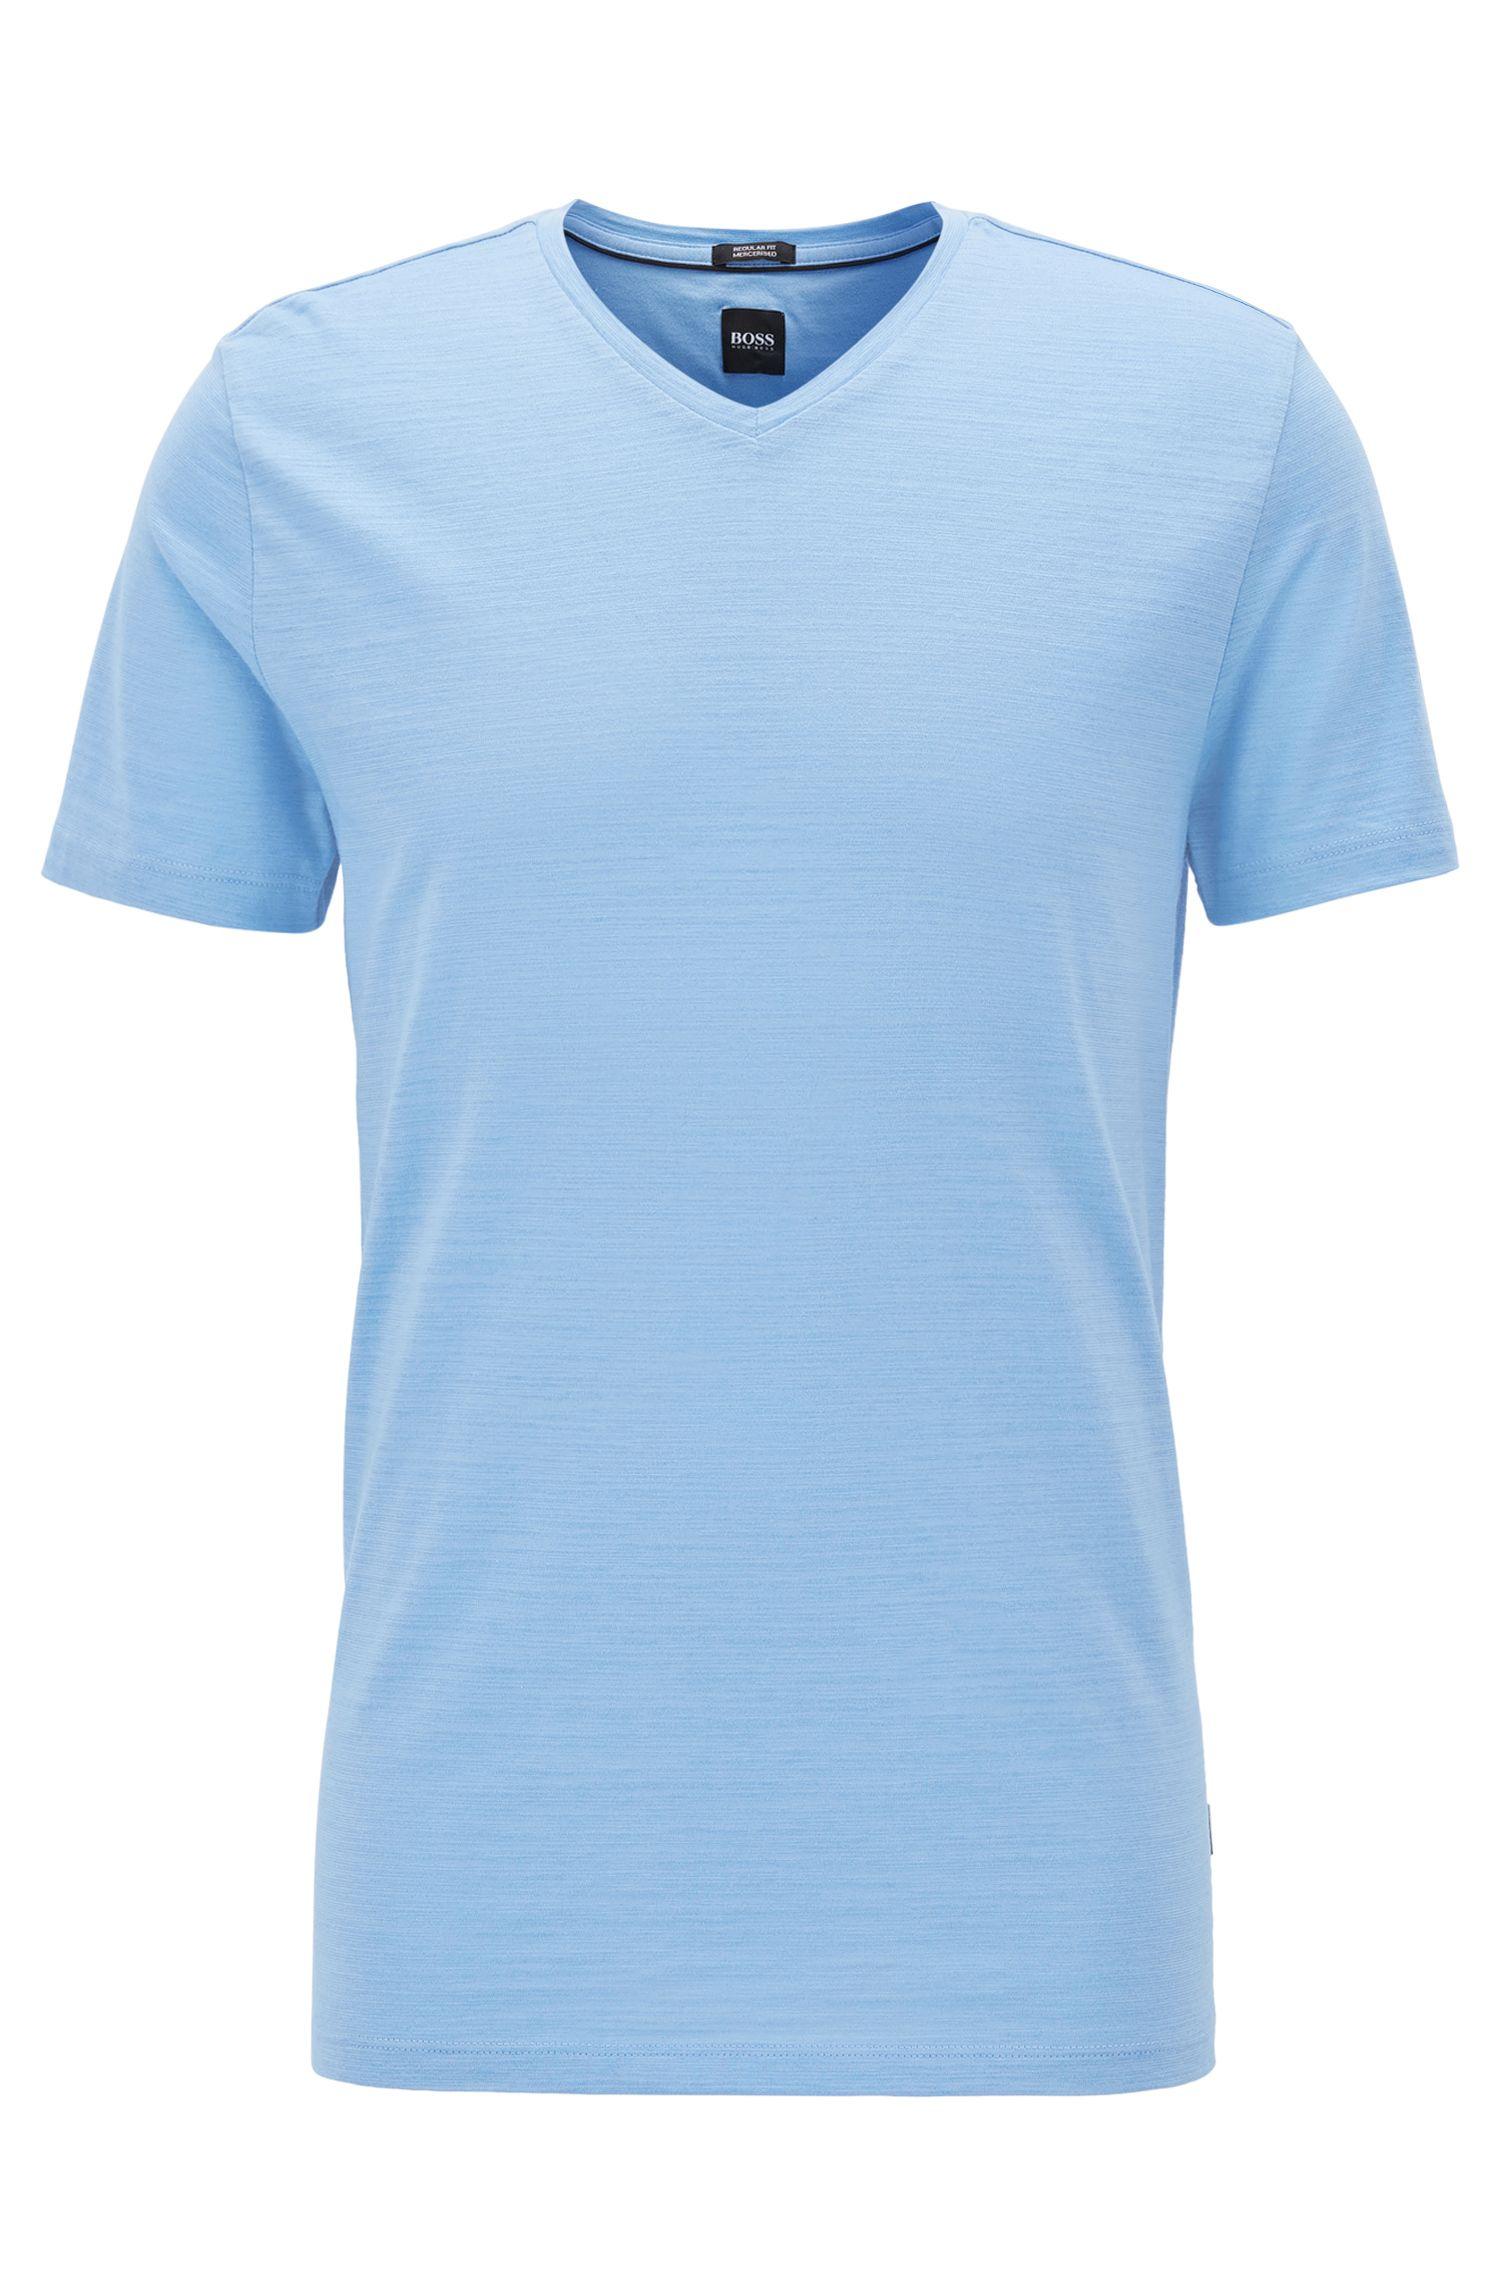 Regular-fit T-shirt in mercerized cotton